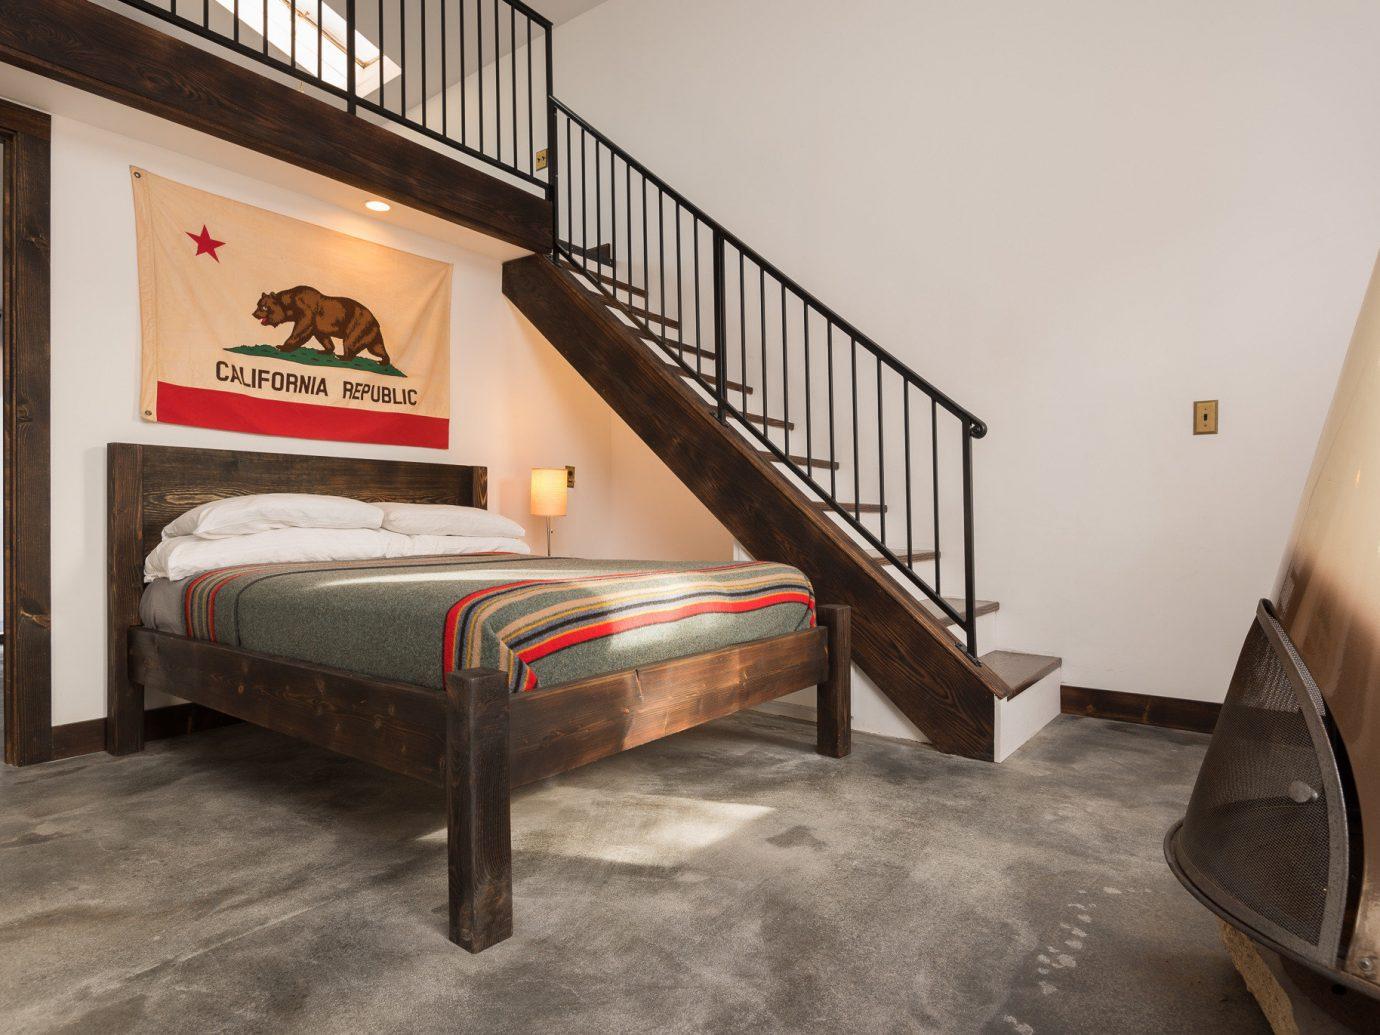 Boutique Hotels Fall Travel Hotels Outdoors + Adventure floor indoor wall room furniture bed frame Bedroom bed flooring interior design real estate wood Suite